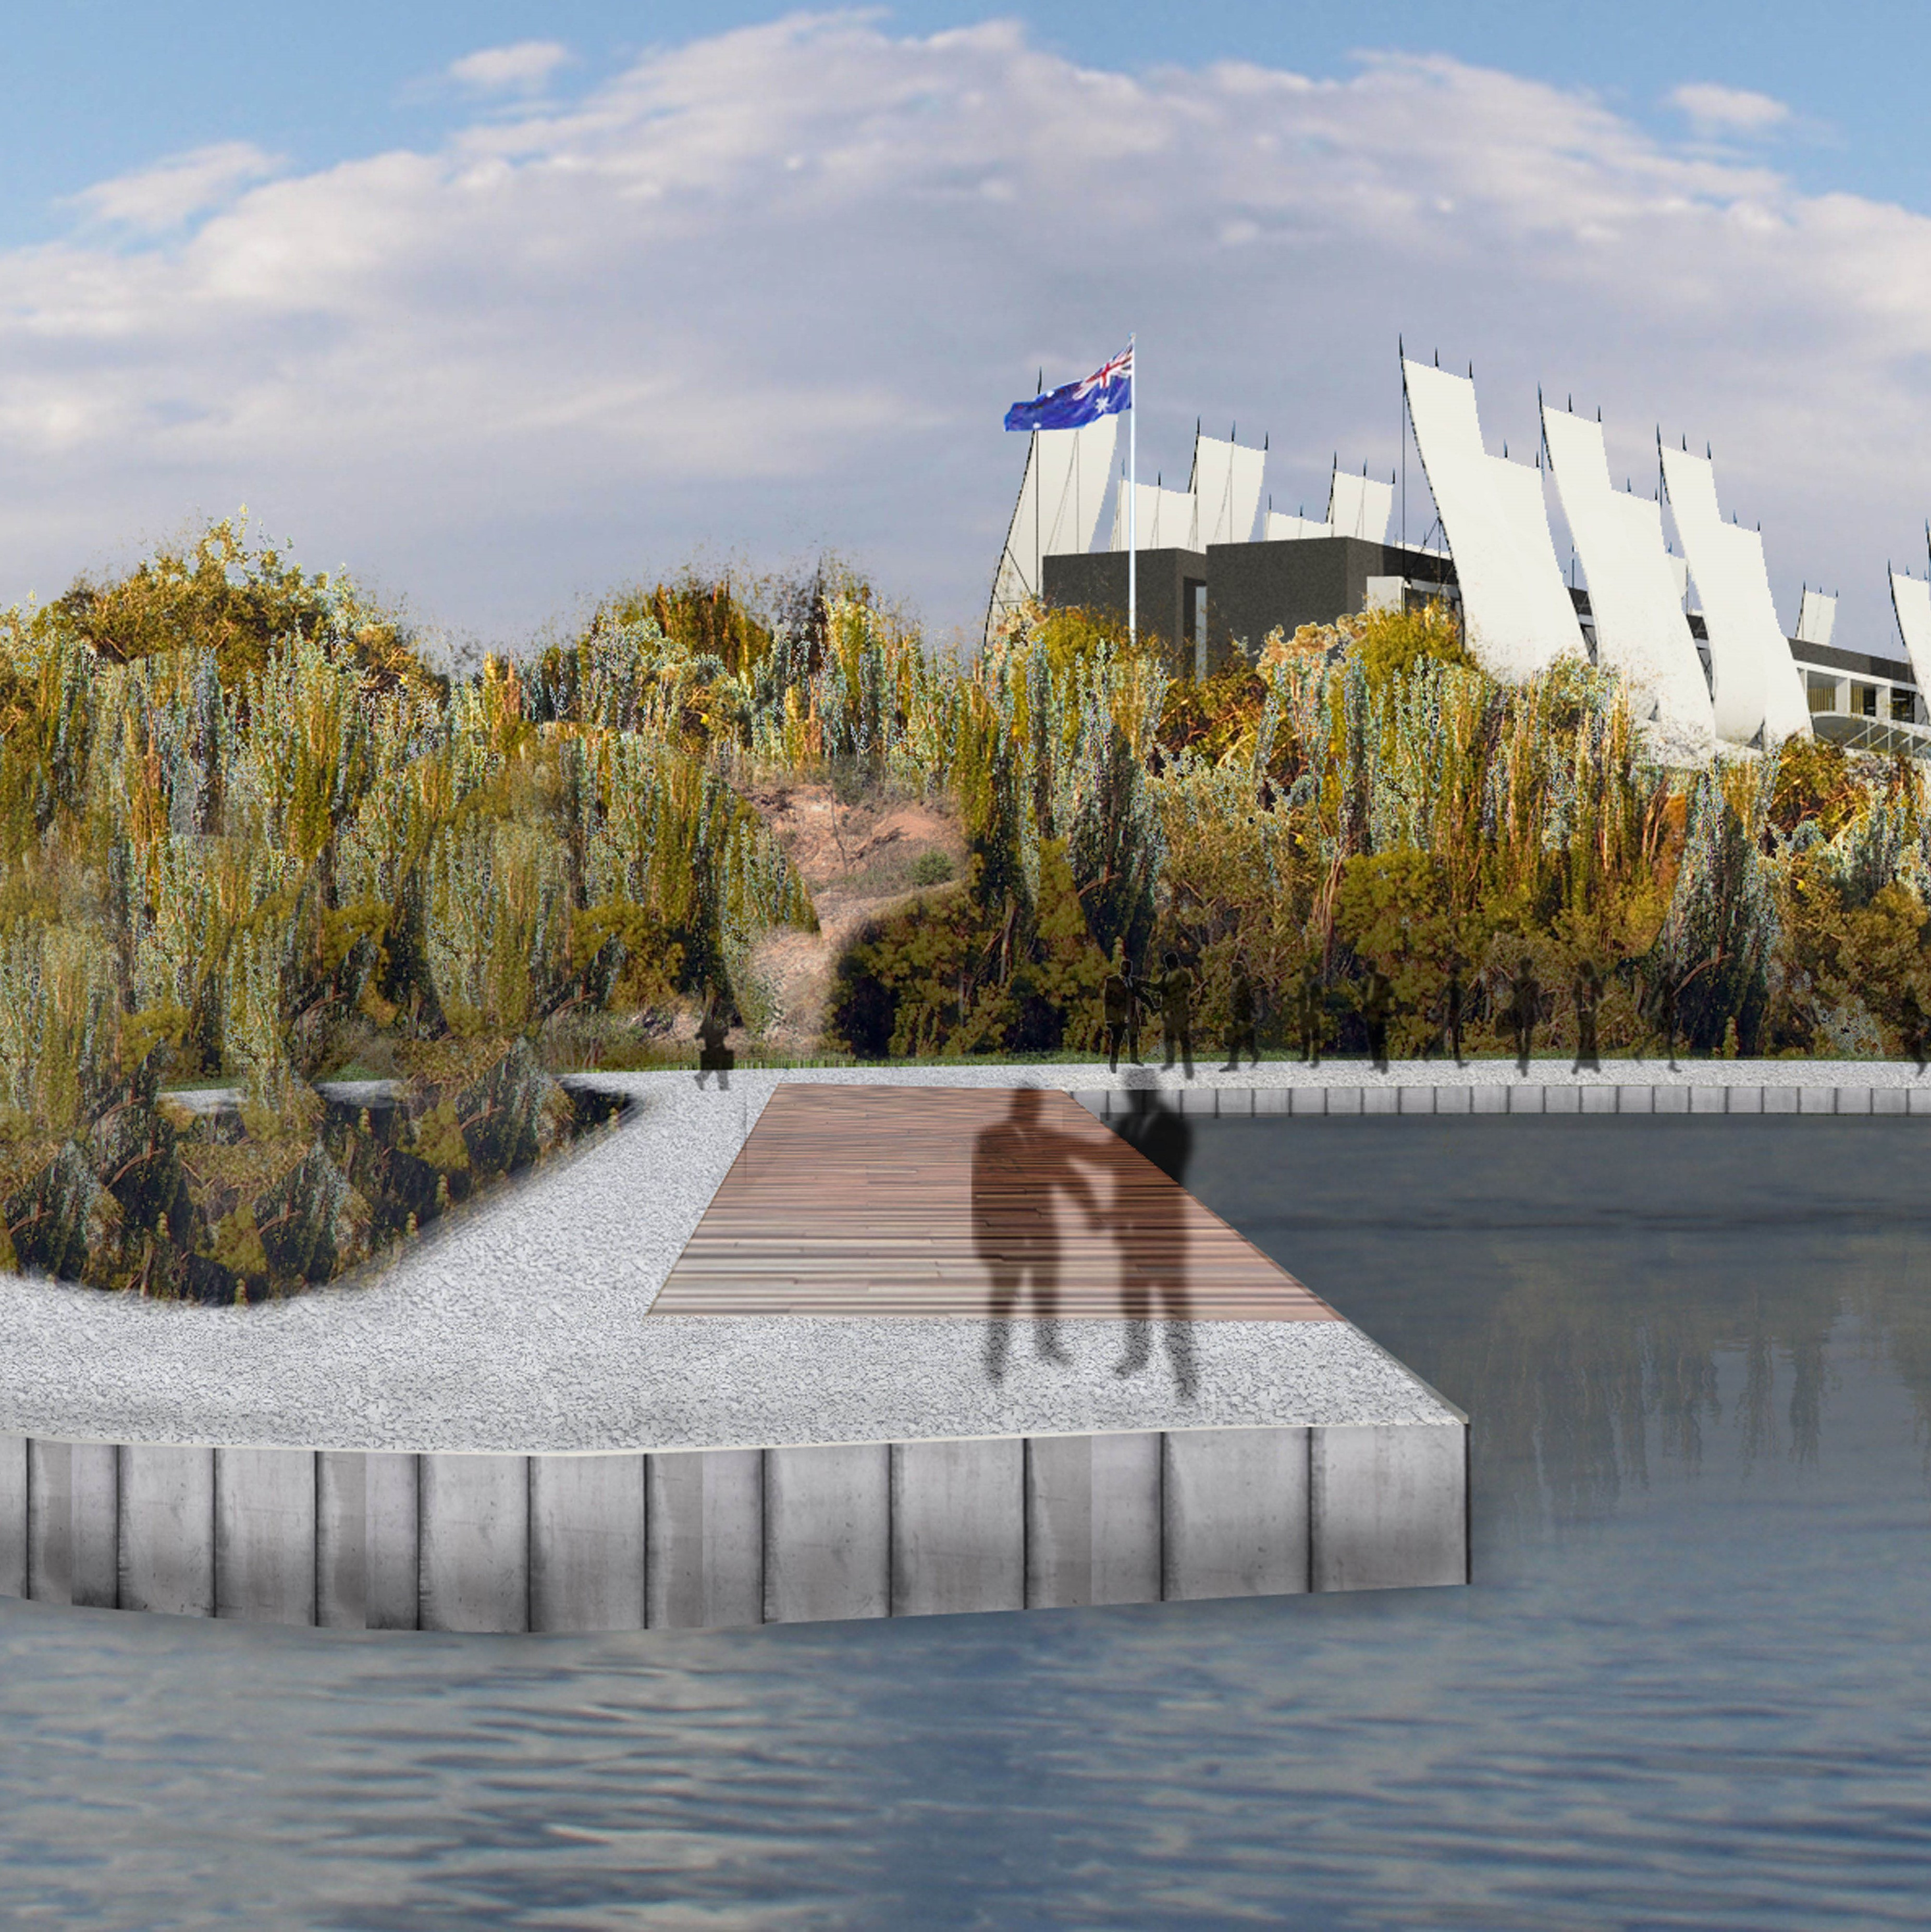 Alex Gorecki, Architecture, Canberra2